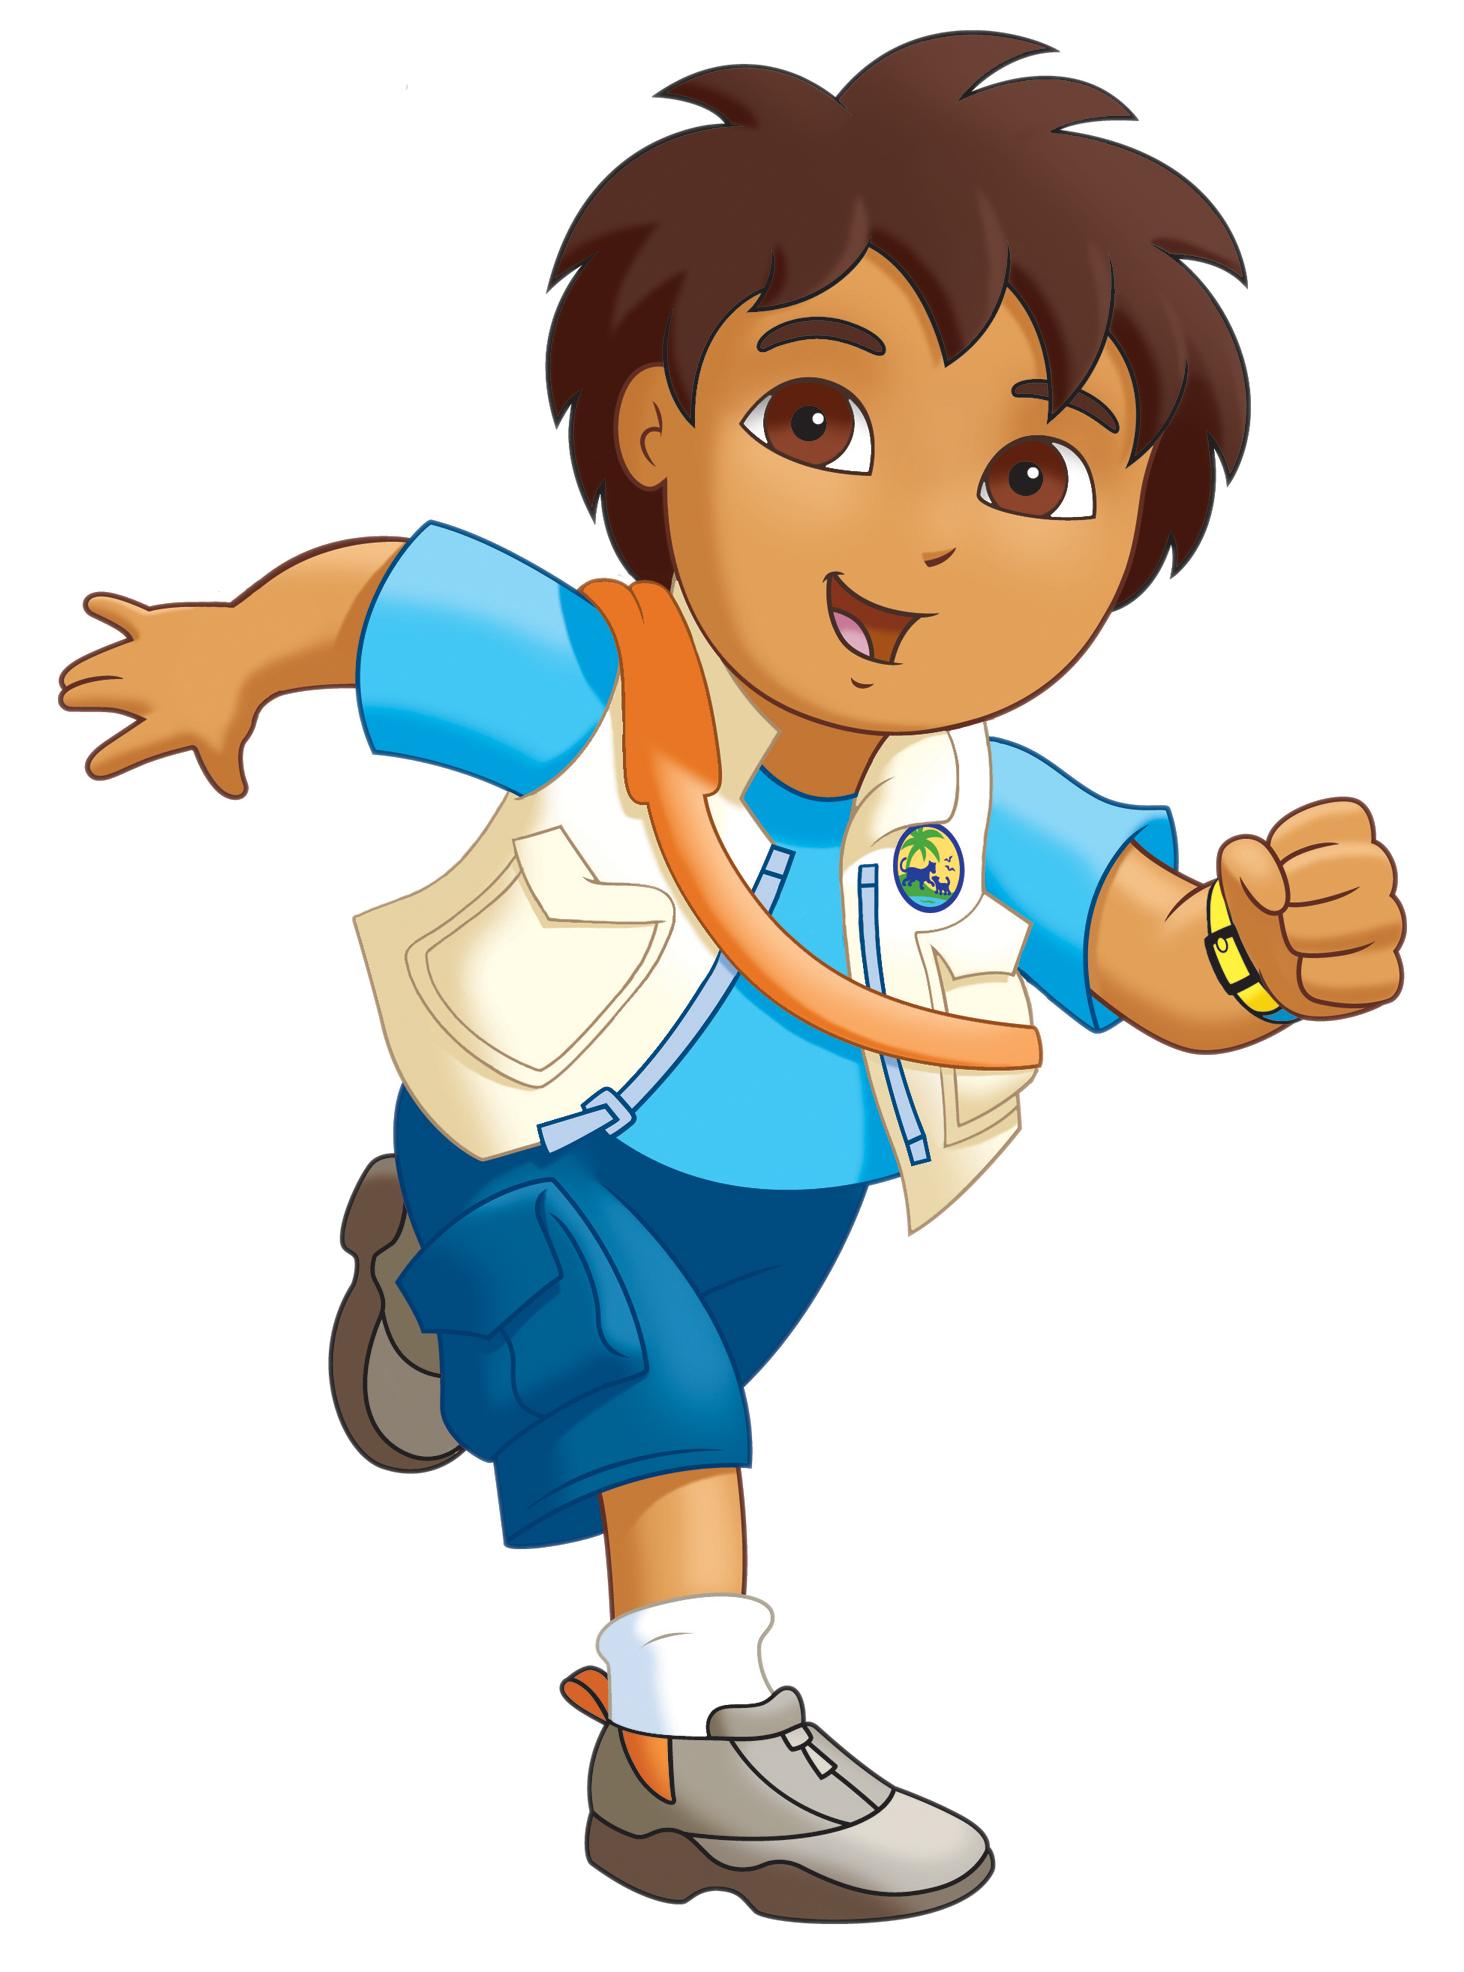 Category:Big Hero 6 Characters | The Parody Wiki | FANDOM